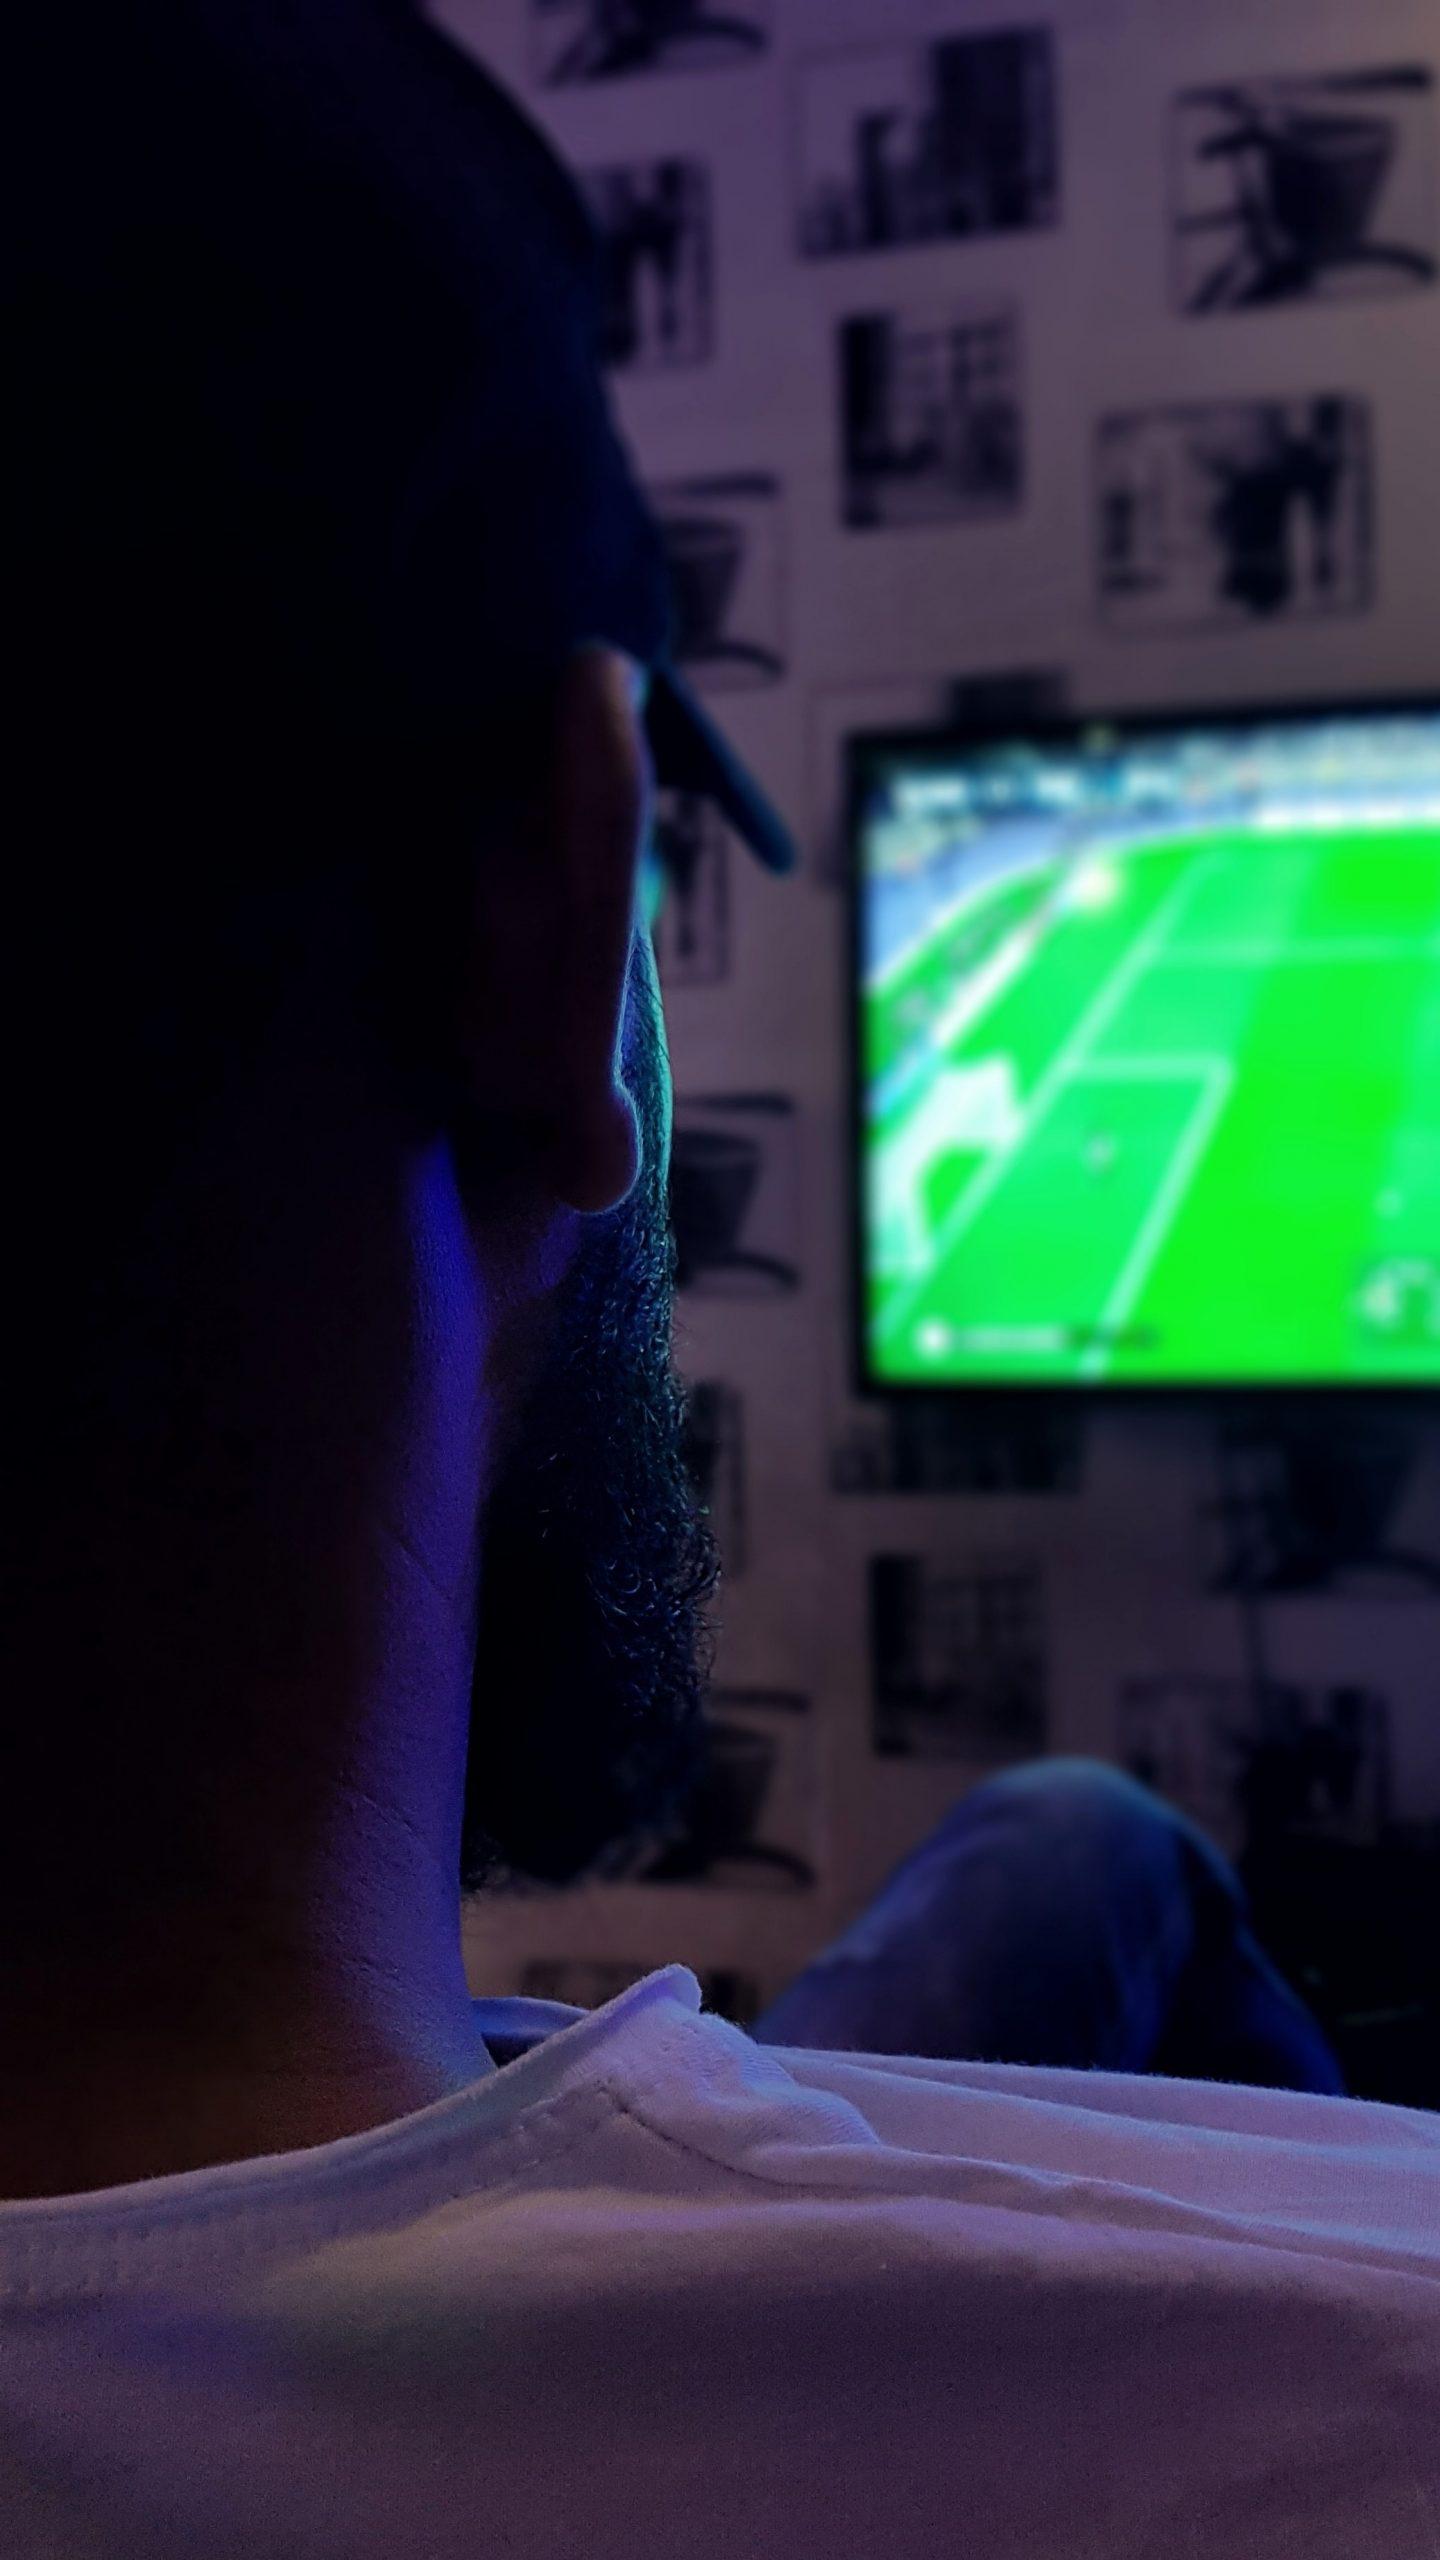 man watching football in the dark